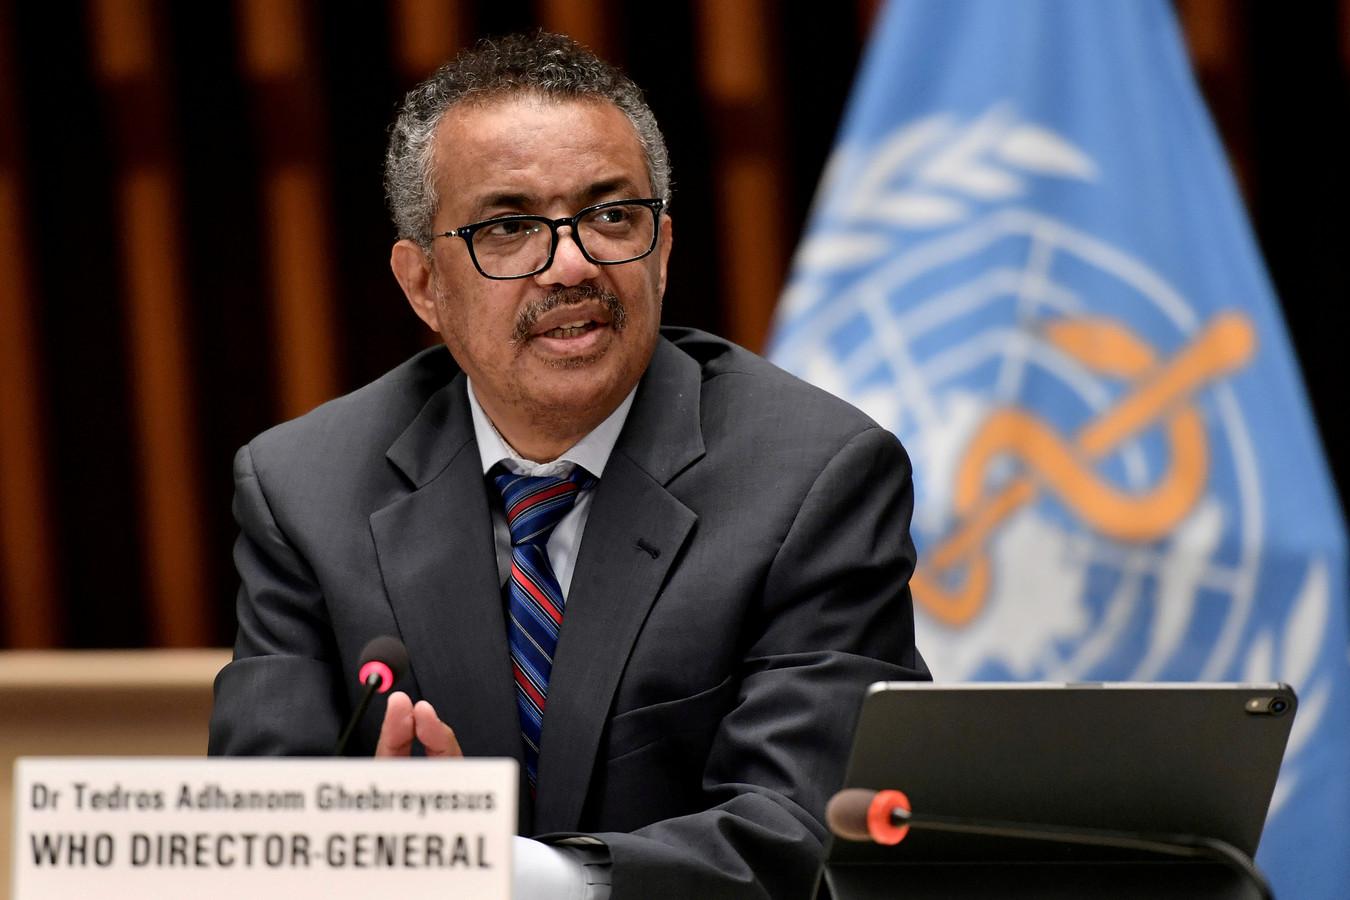 Tedros Adhanom Ghebreyesus, directeur général de l'OMS